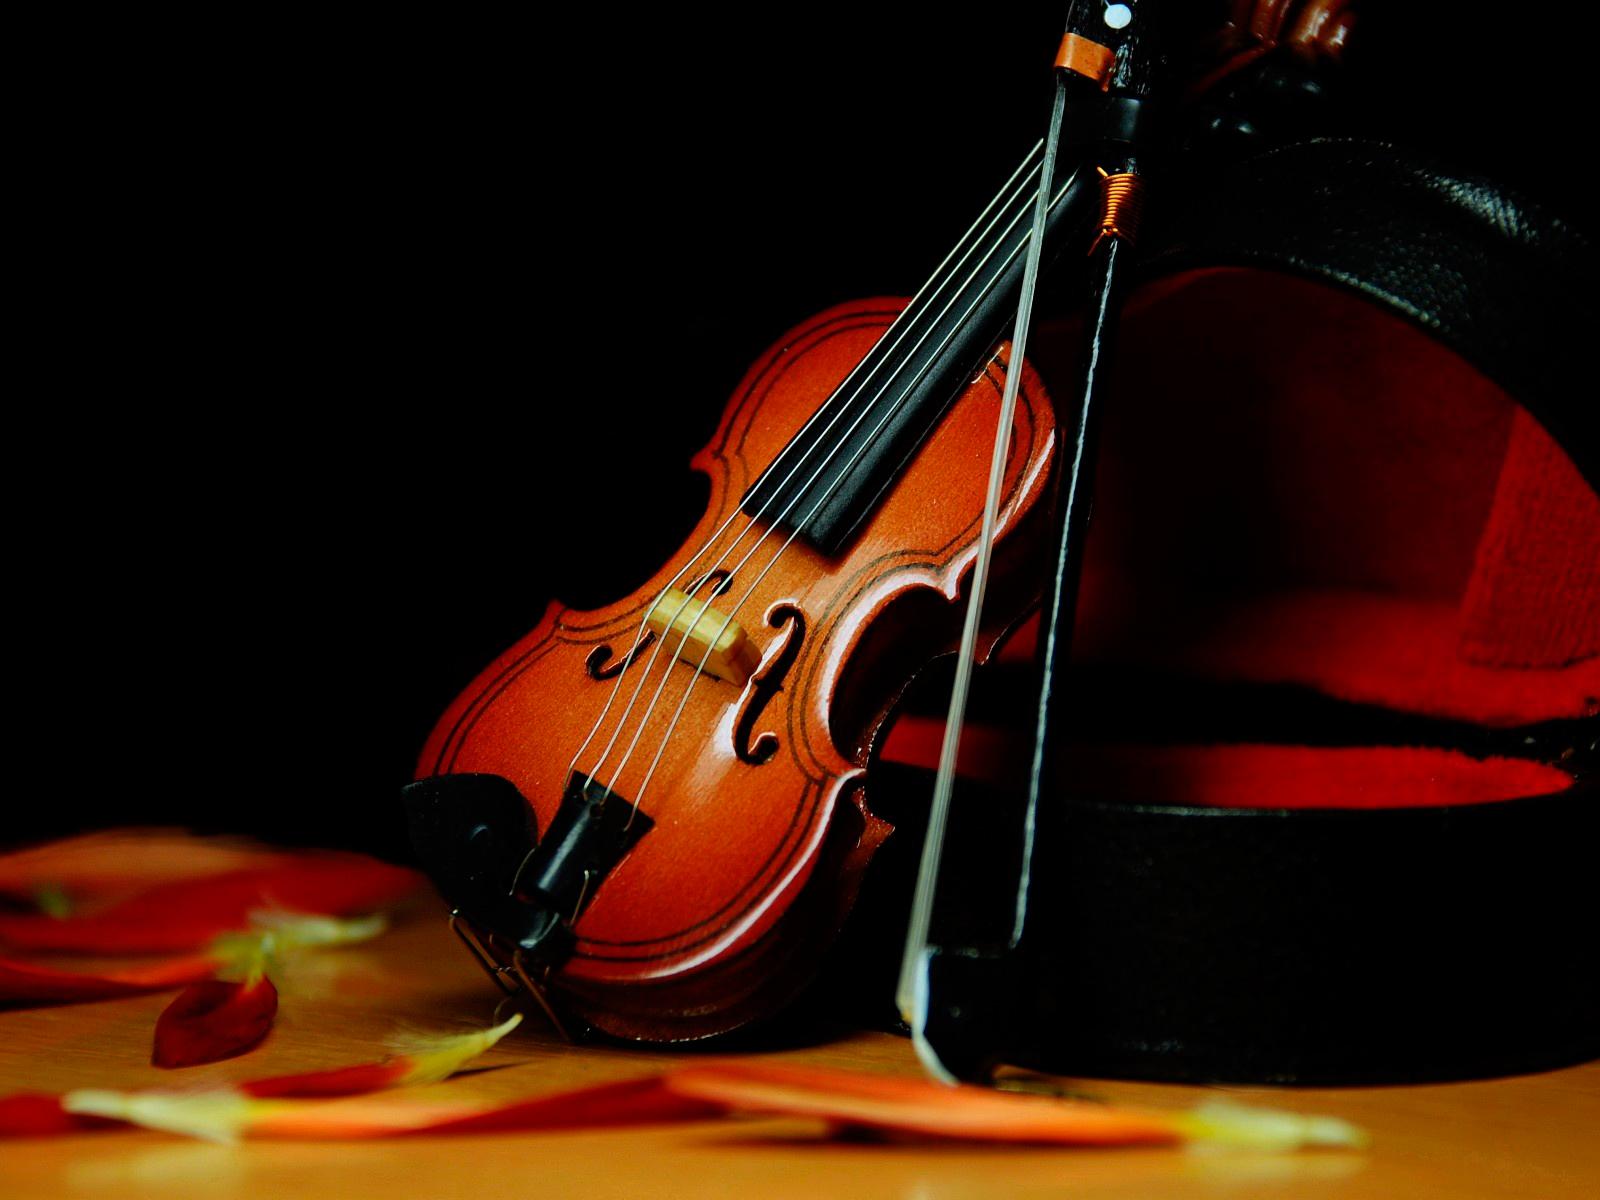 Cello Wallpaper Photo 22287 Hd Pictures: Fondos De Pantalla De Violines